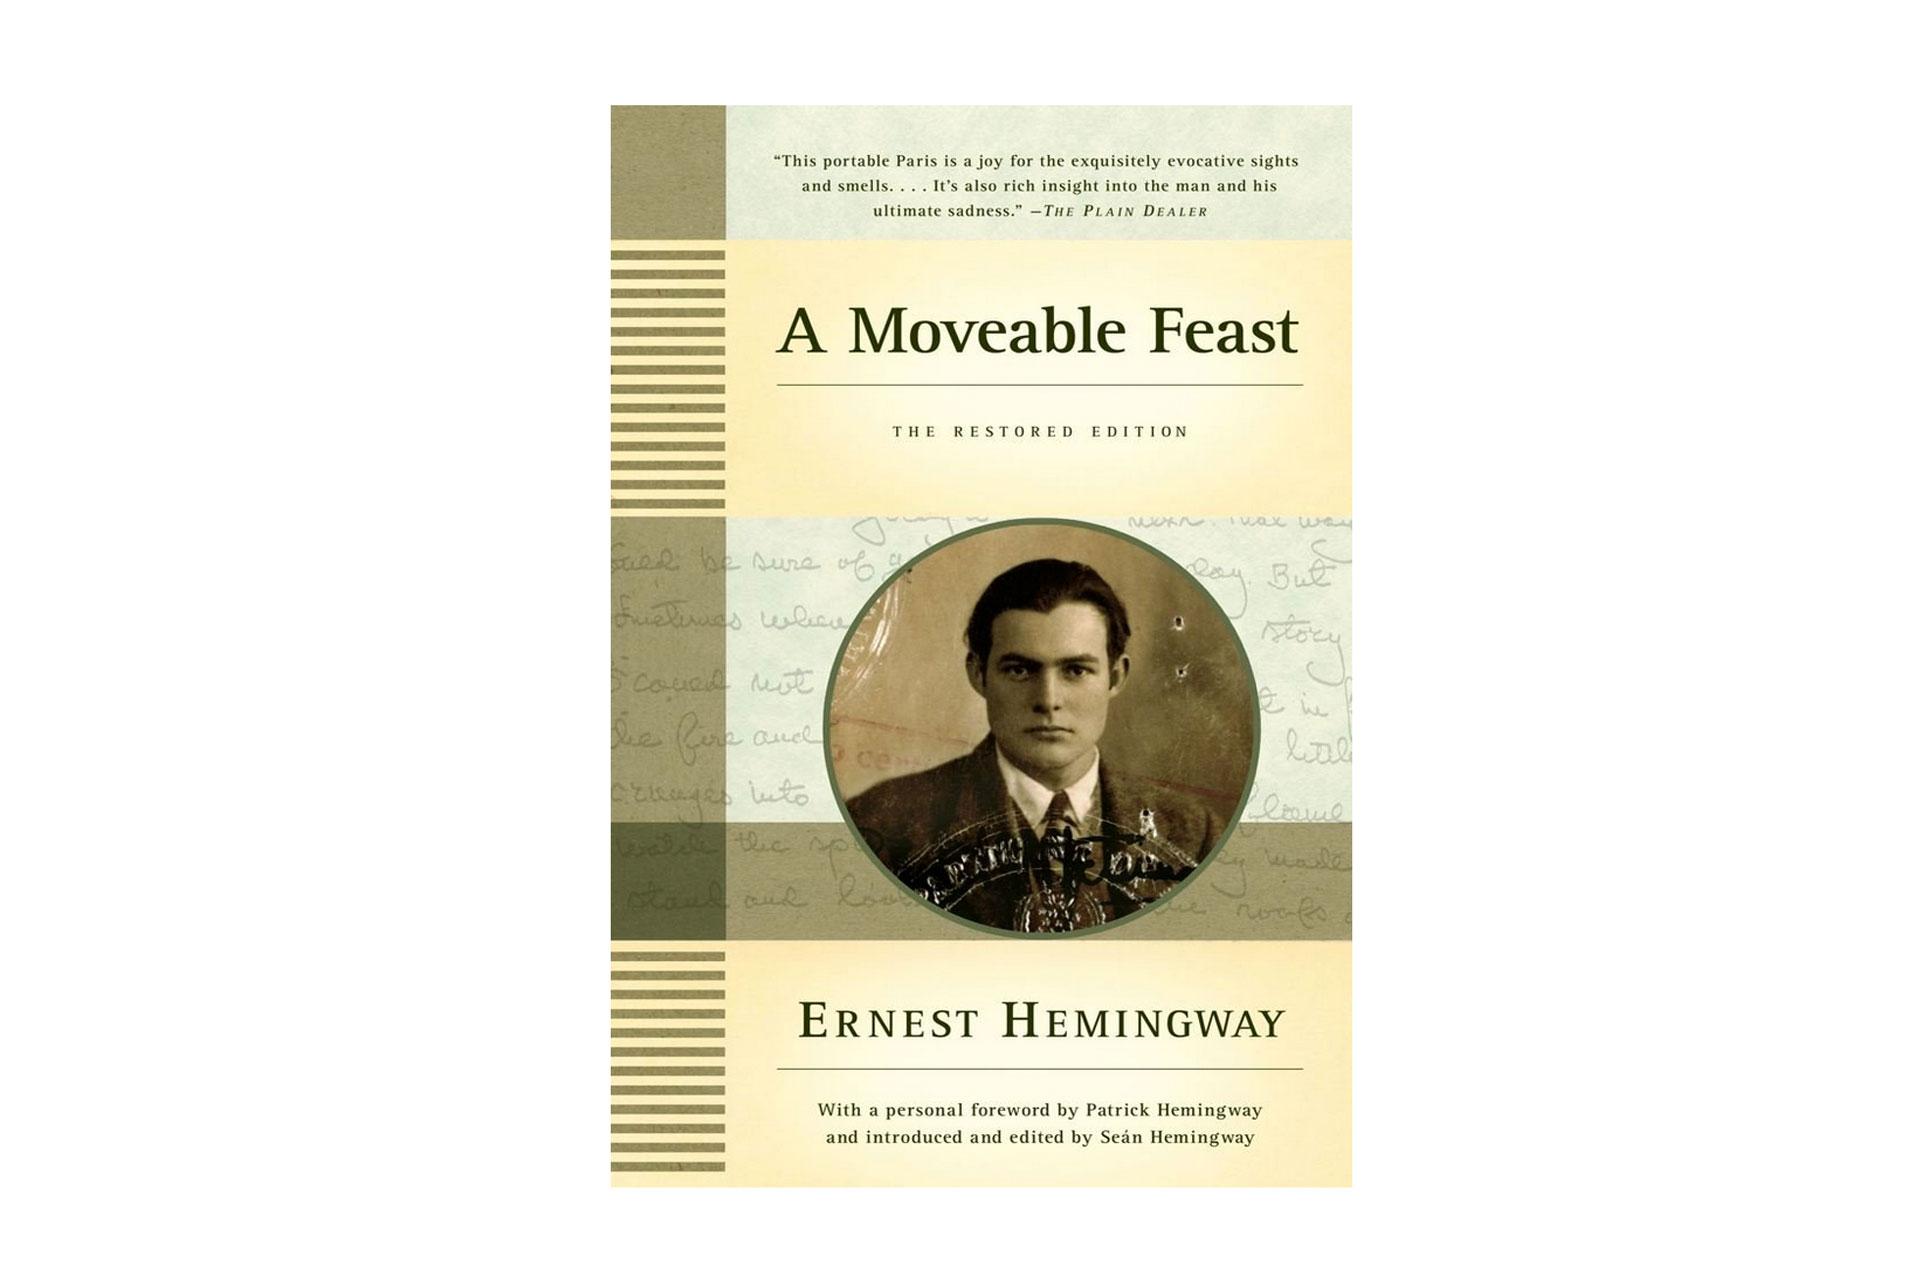 A Moveable Feast Book; Courtesy of Amazon